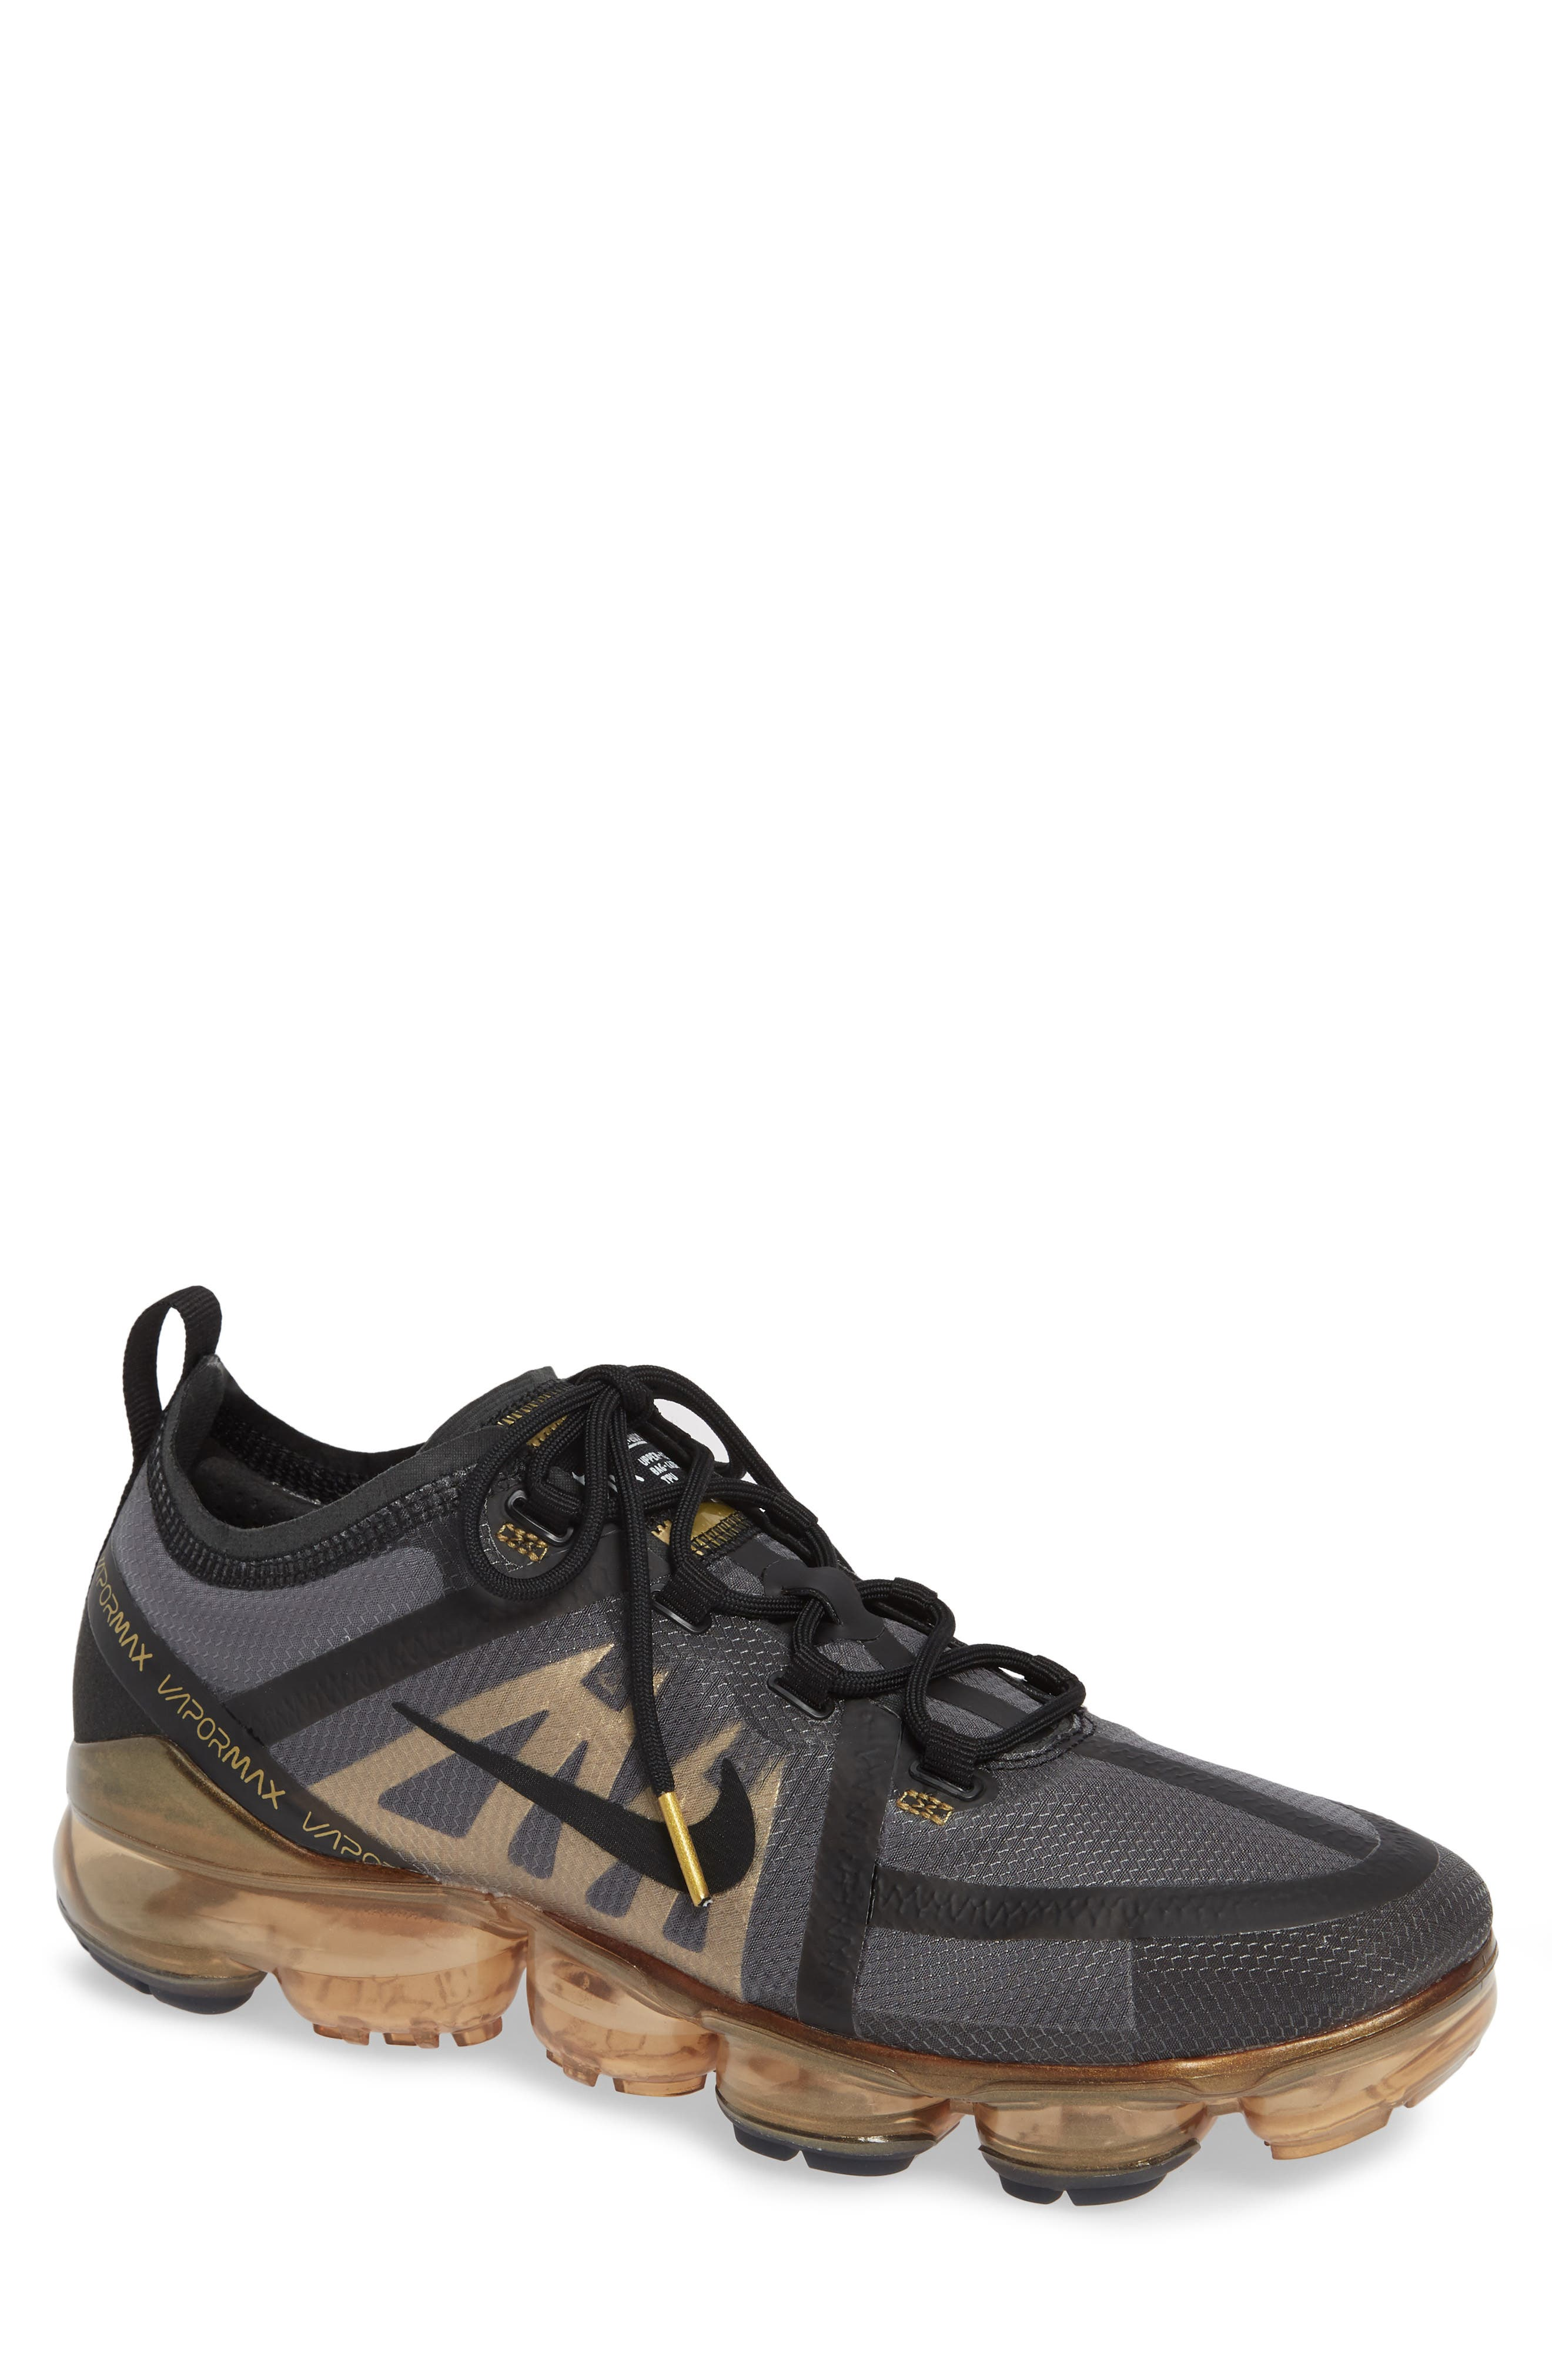 NIKE,                             Air VaporMax 2019 Running Shoe,                             Main thumbnail 1, color,                             BLACK/ METALLIC GOLD